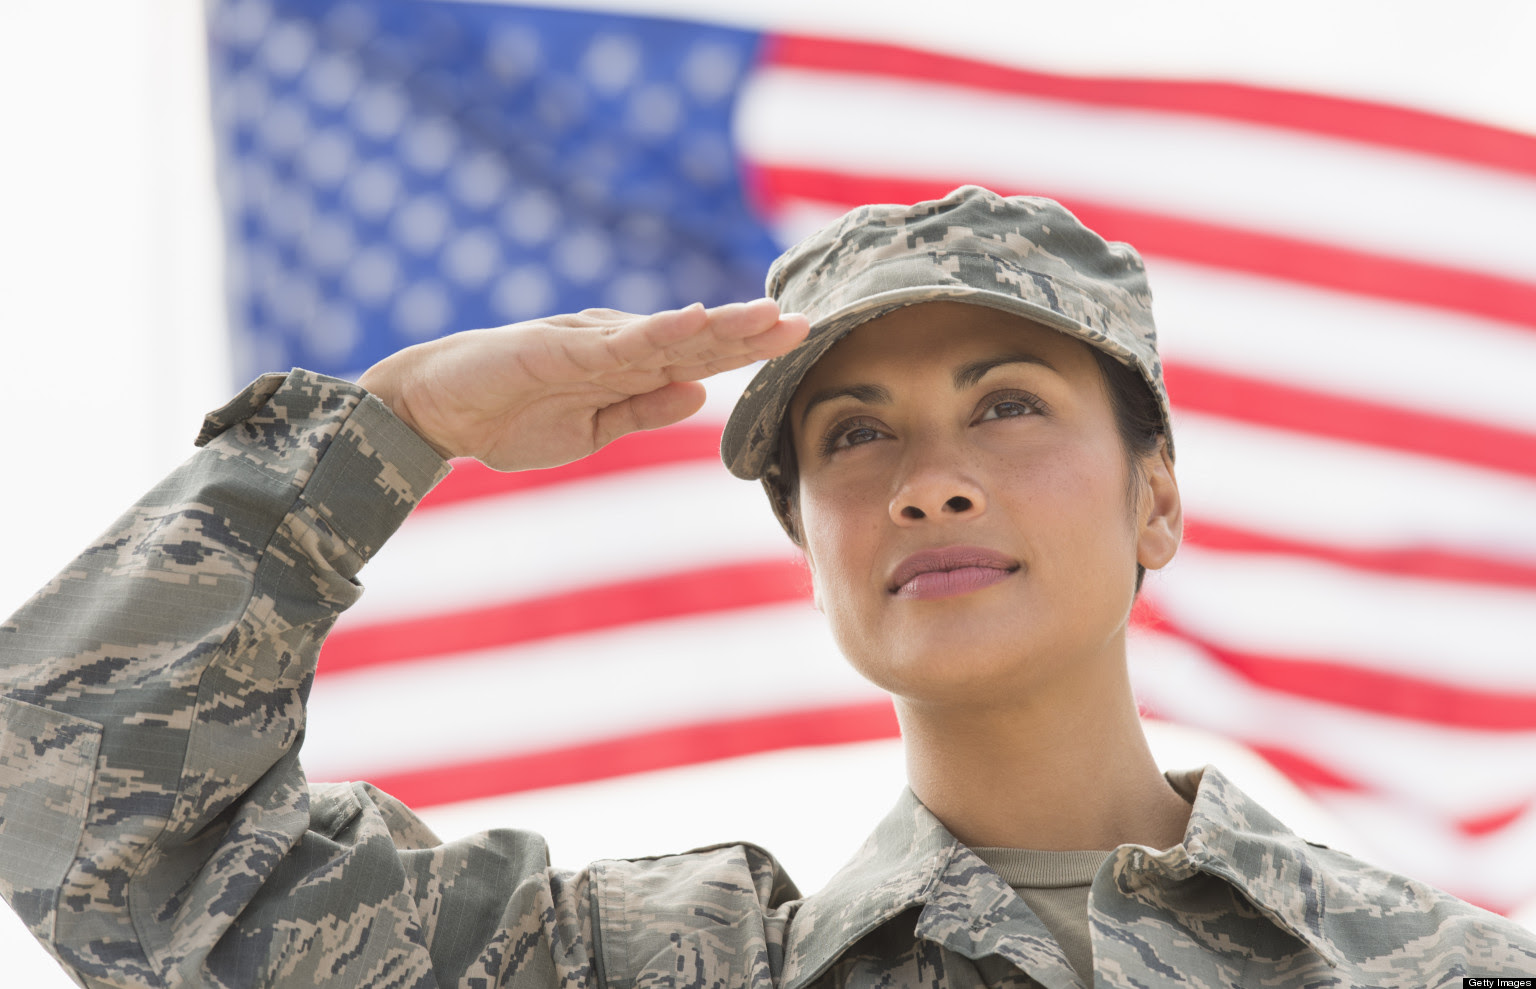 http://i.huffpost.com/gen/1153966/thumbs/o-WOMEN-MILITARY-facebook.jpg